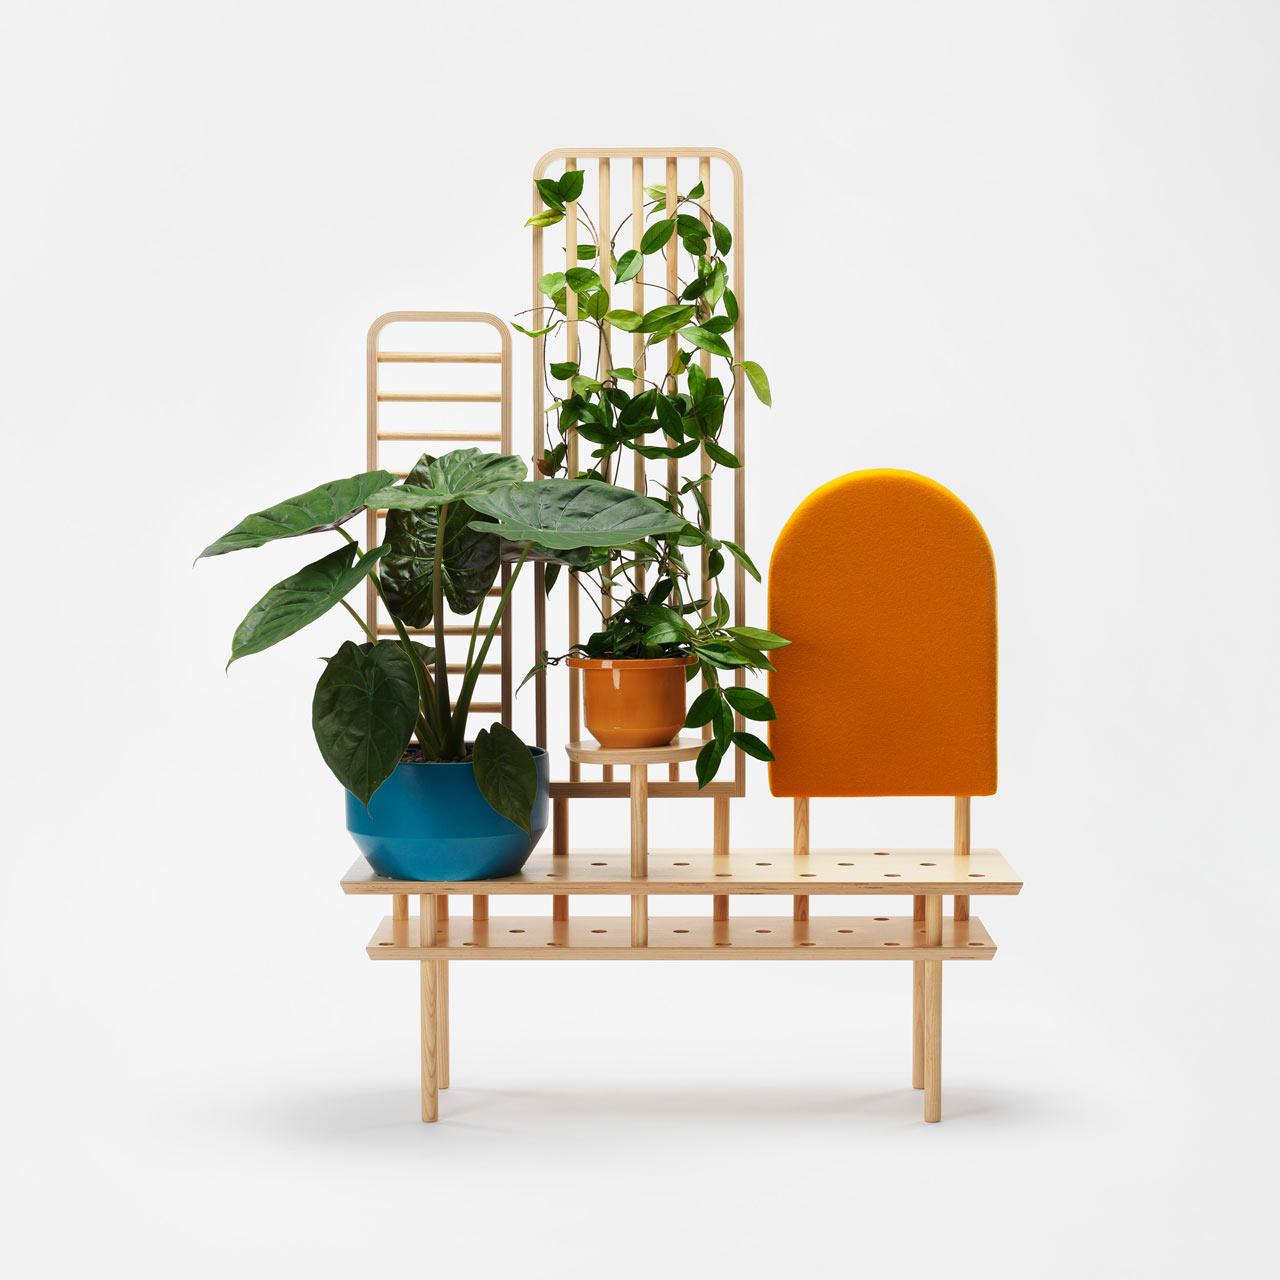 multifunctional furniture. etta: multifunctional furniture for indoor plants